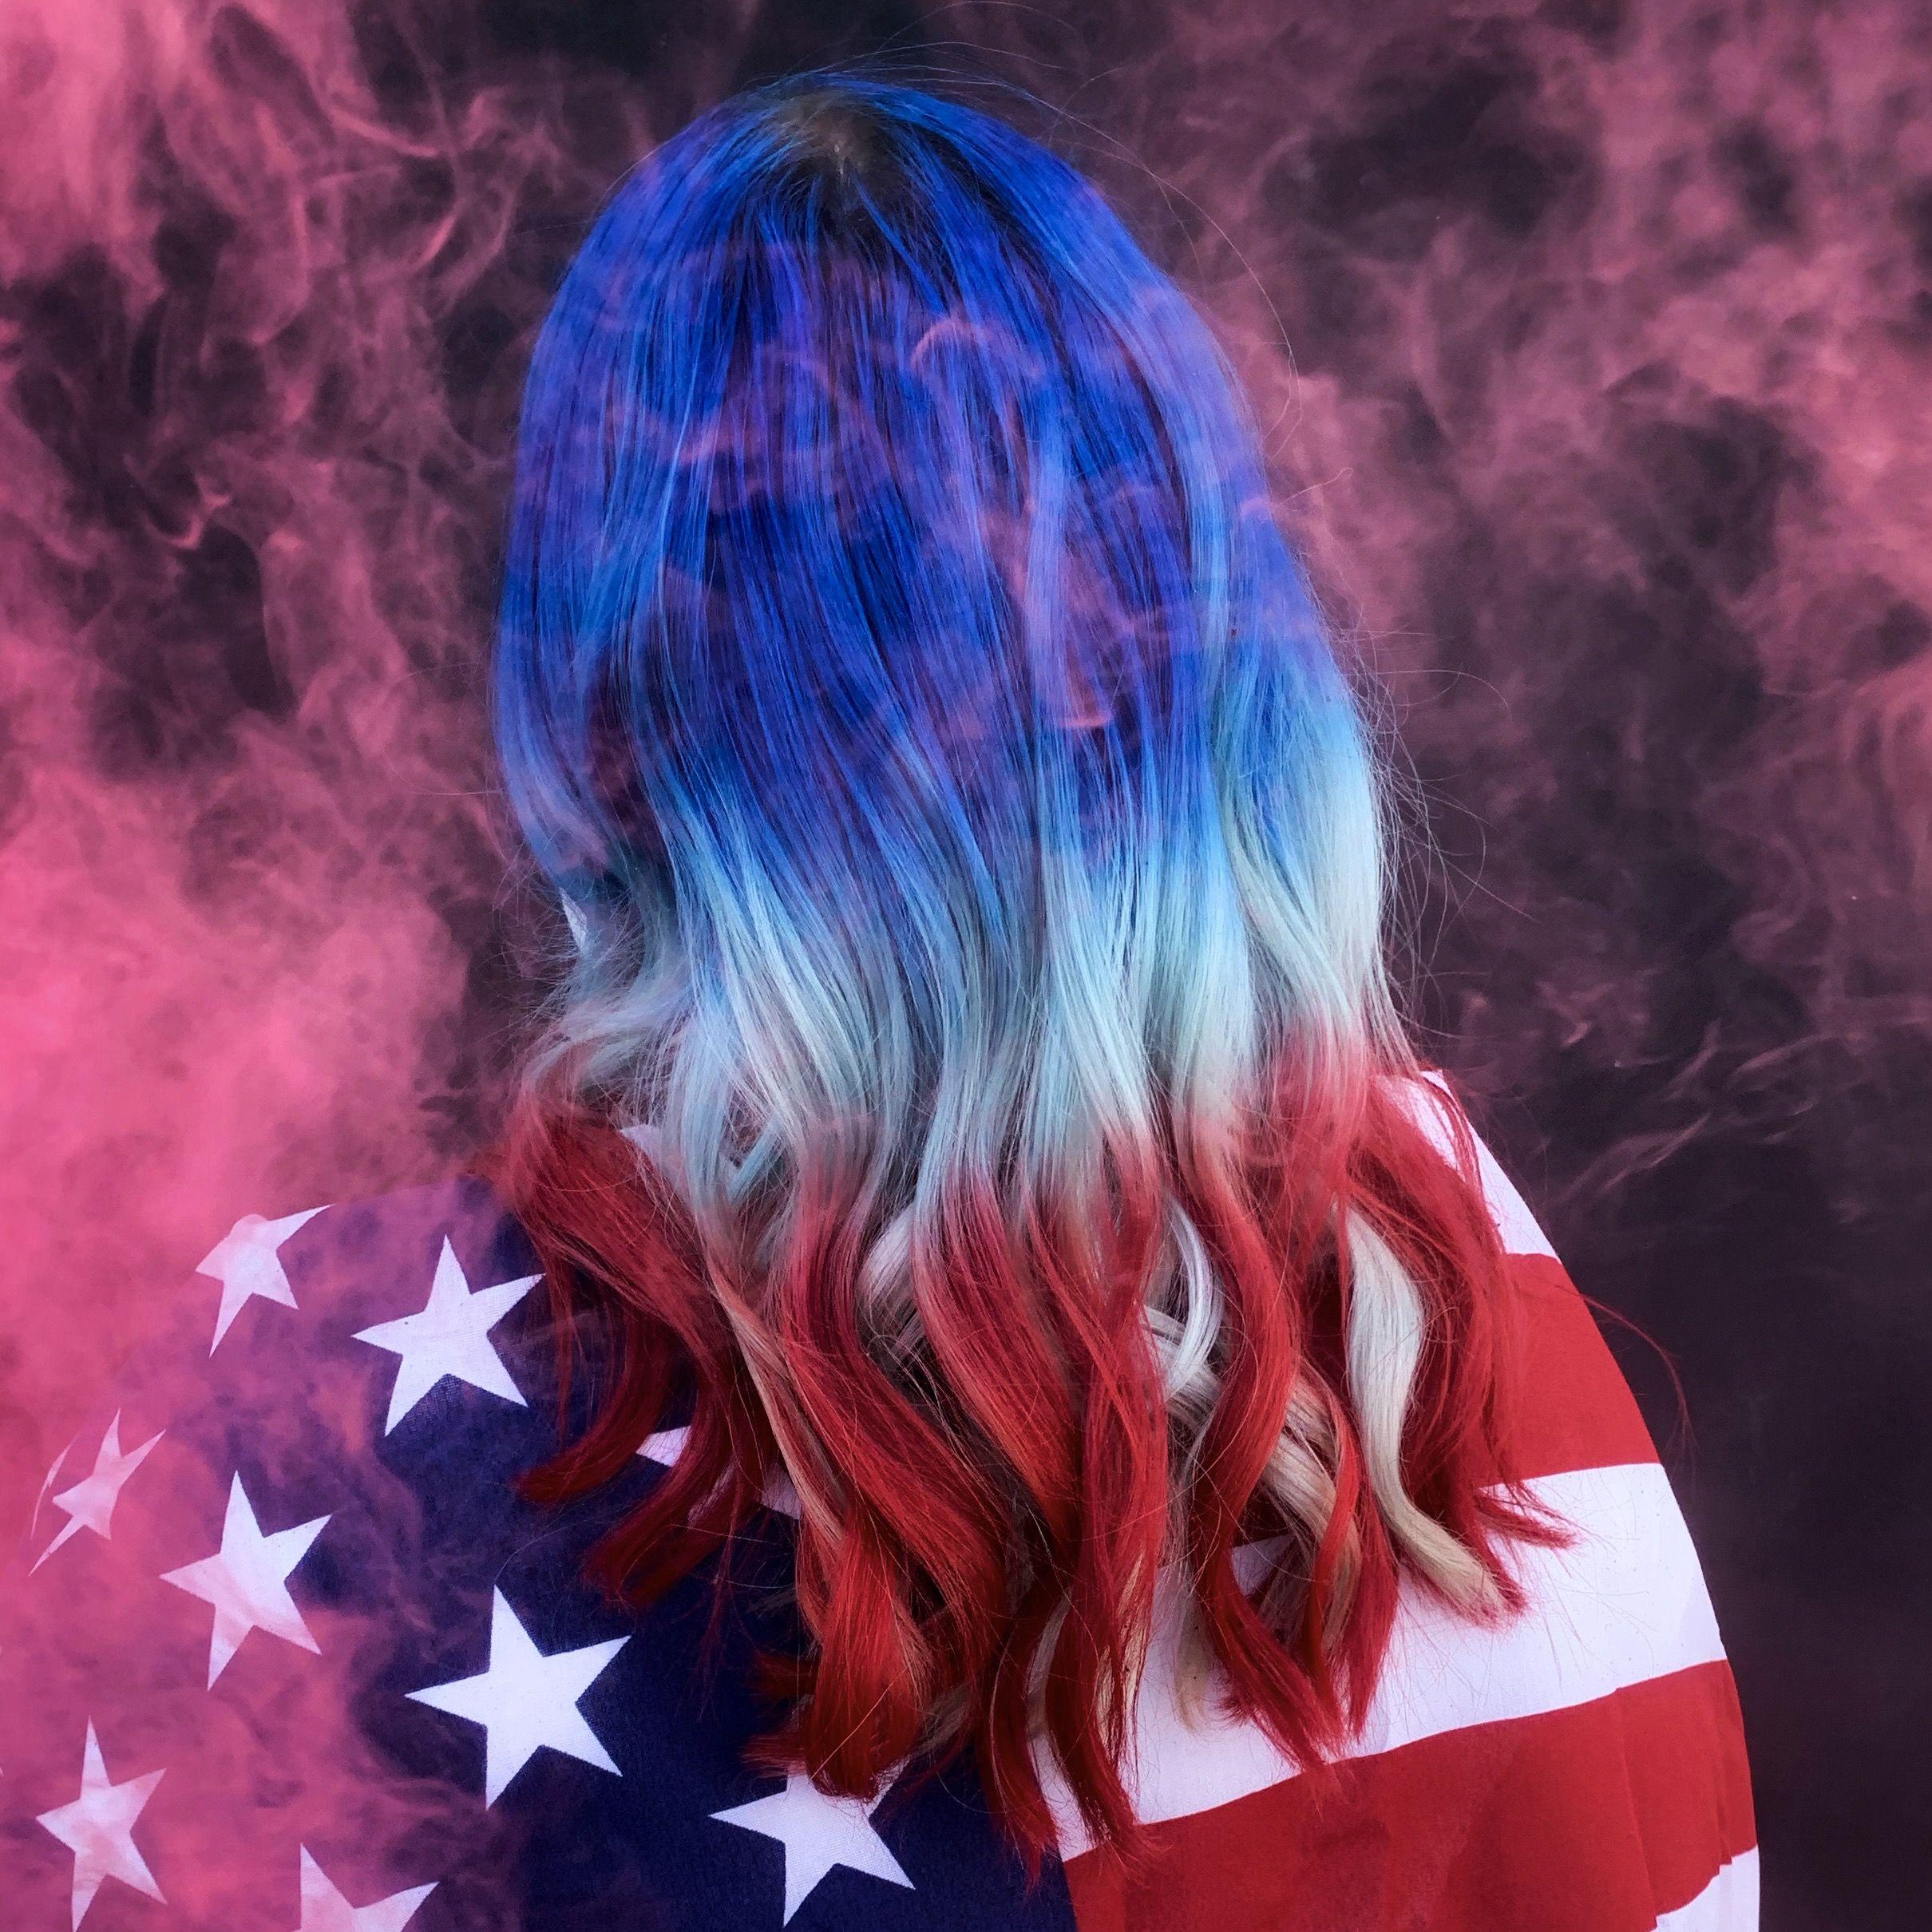 Red White And Blue Hair Dyed Hair Blue Blue Hair Hair Dye Colors